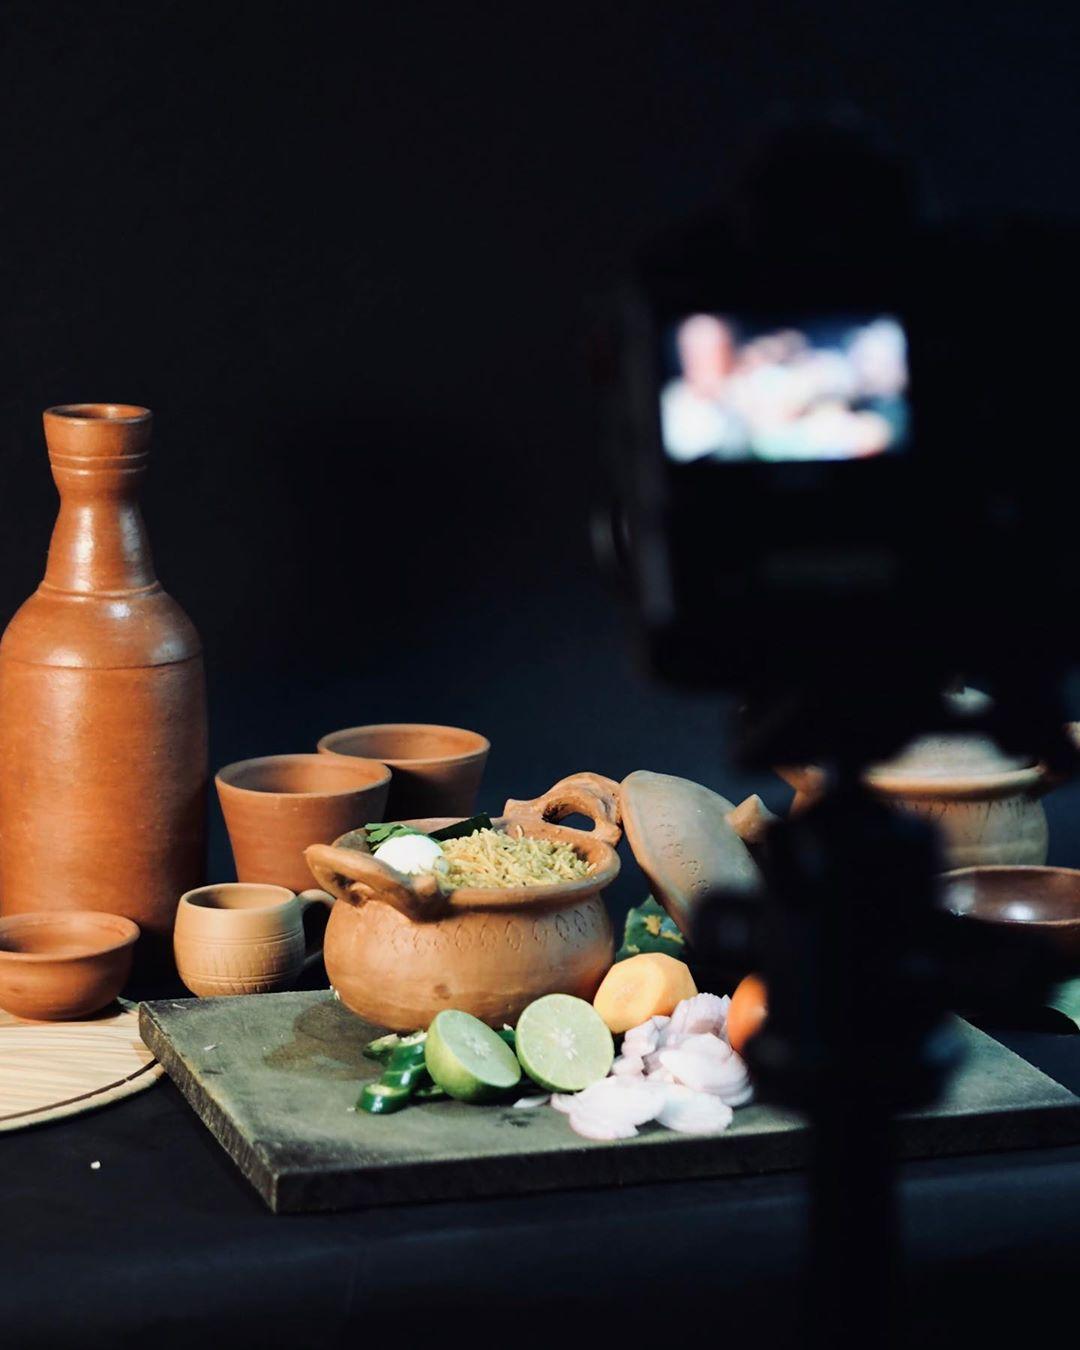 grace's pot best biryani in Singapore